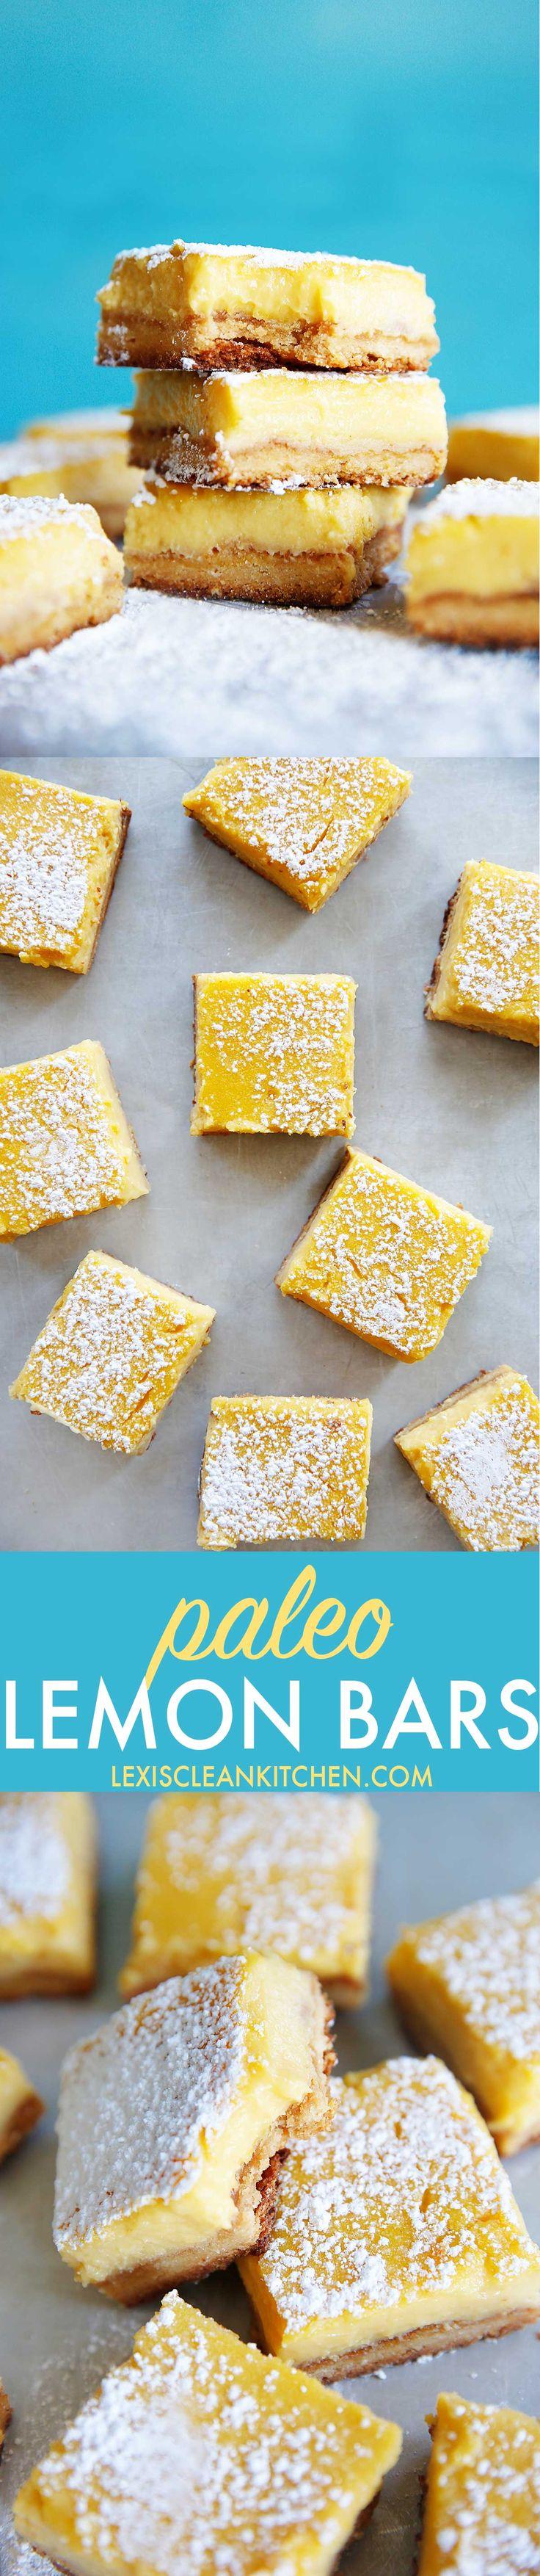 Lemon Bars {Paleo-friendly, grain-free, gluten-free} | Lexi's Clean Kitchen